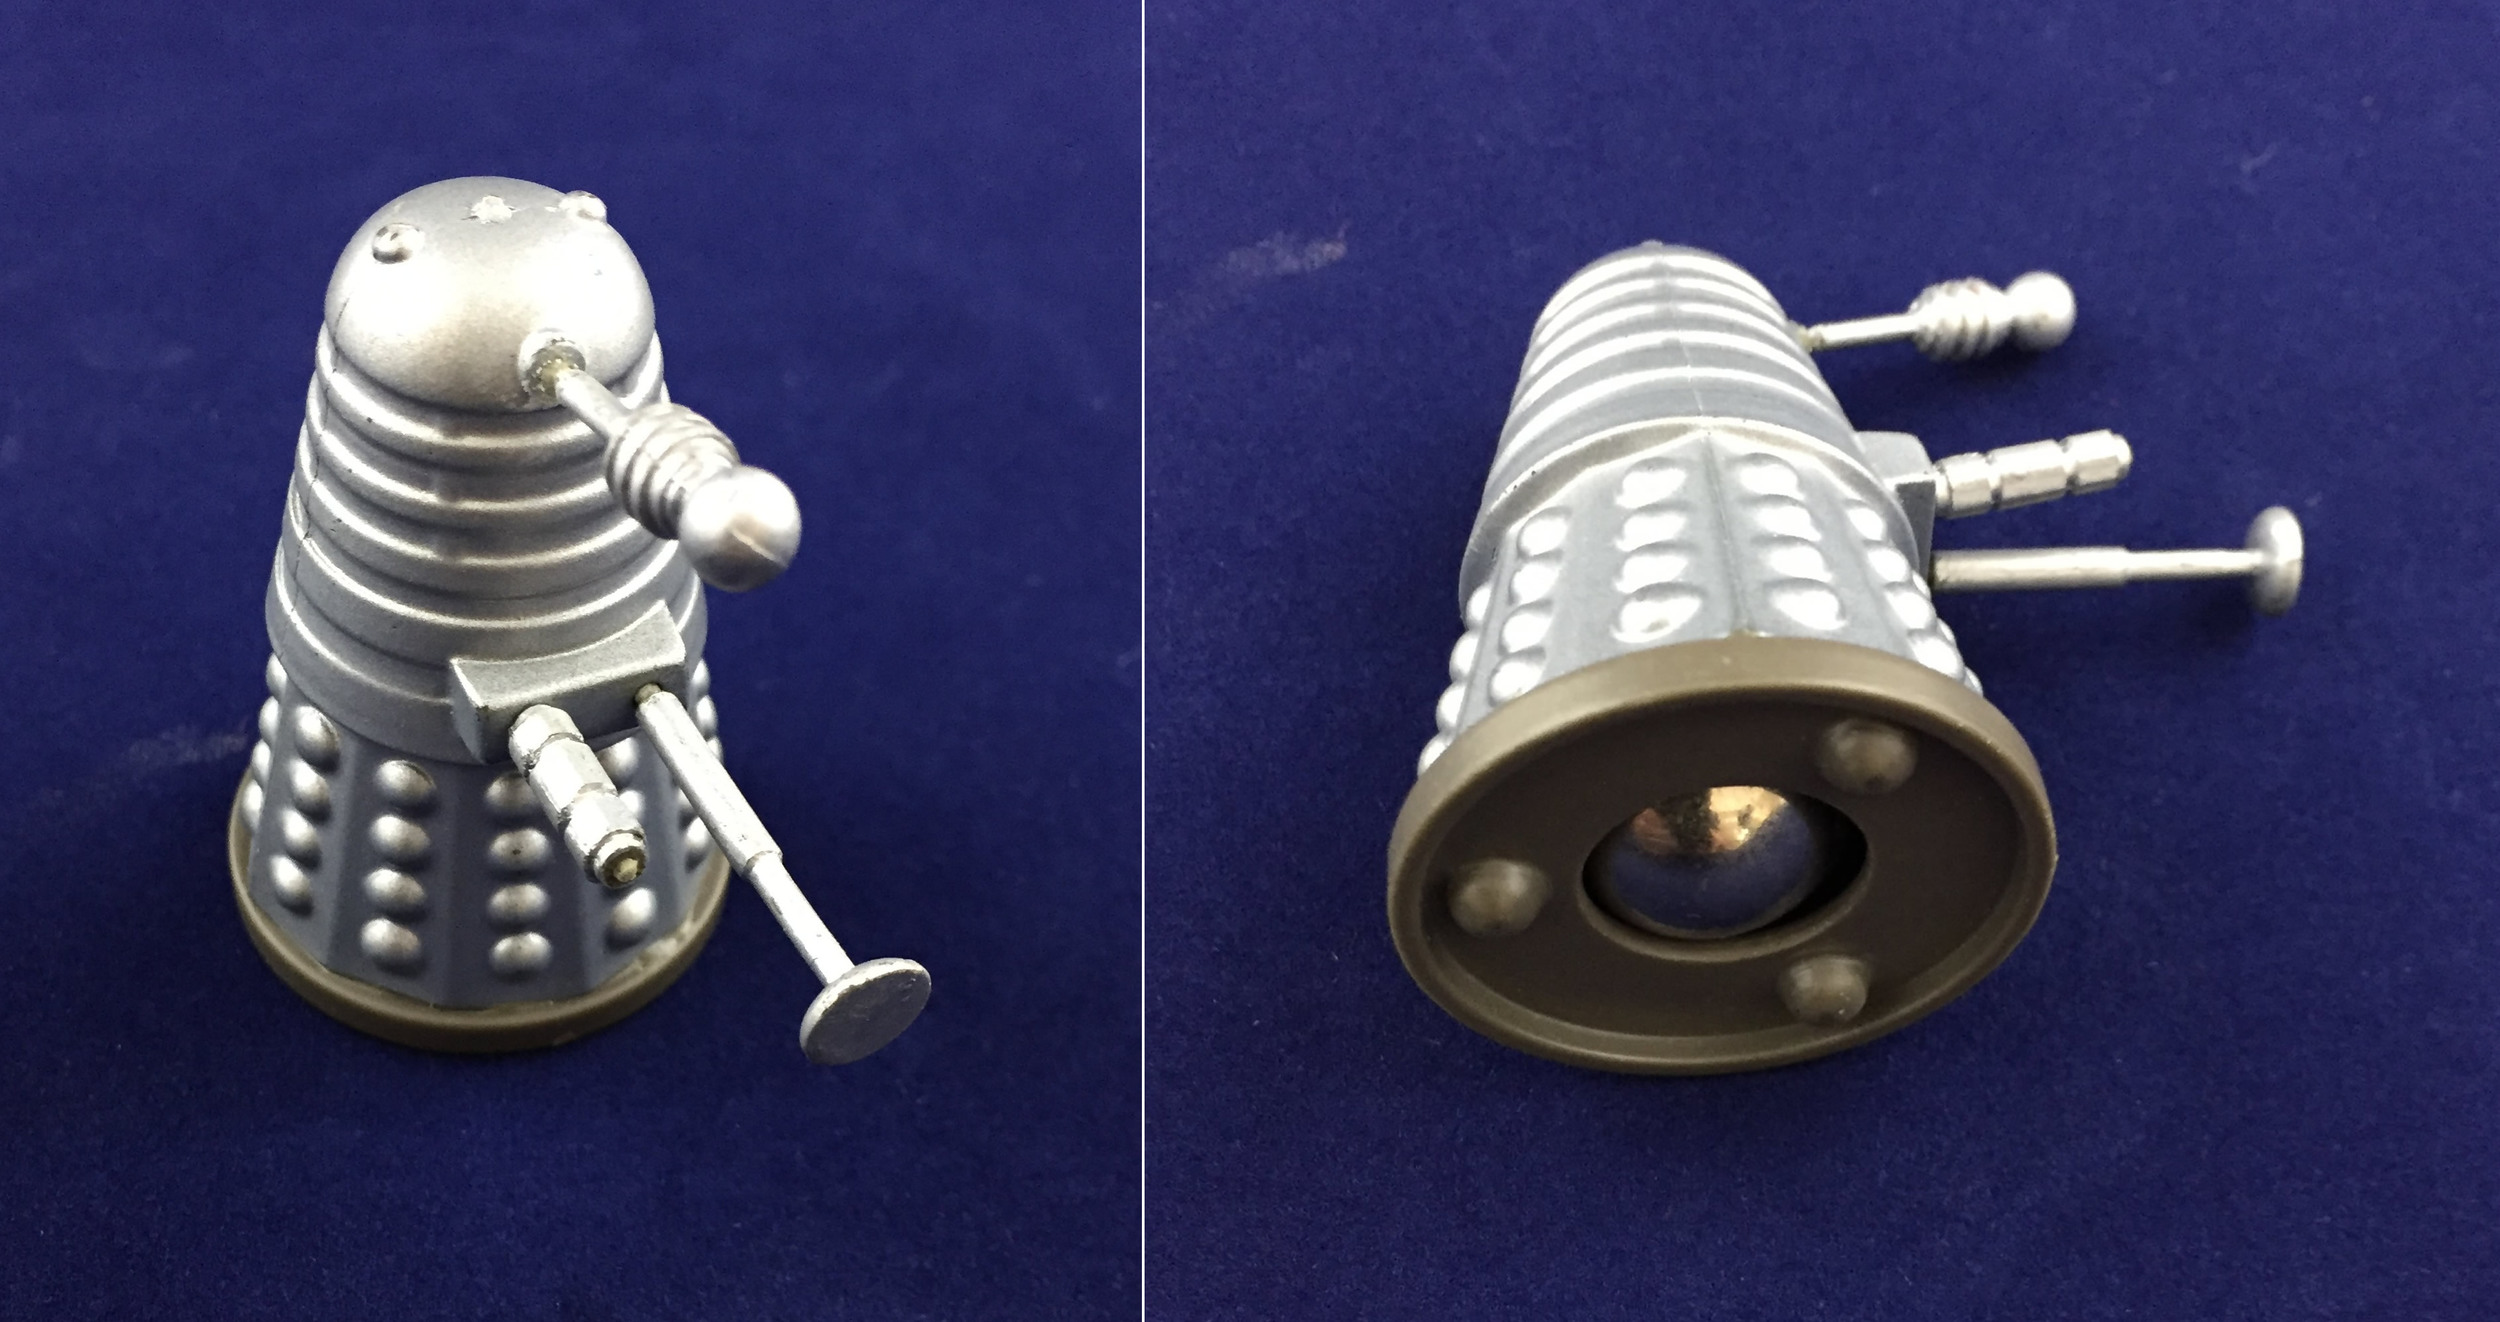 Louis Marx and Company Ltd., prototype 2-inch Dalek Rolykin (standard production Rolykin is 1-inch tall)